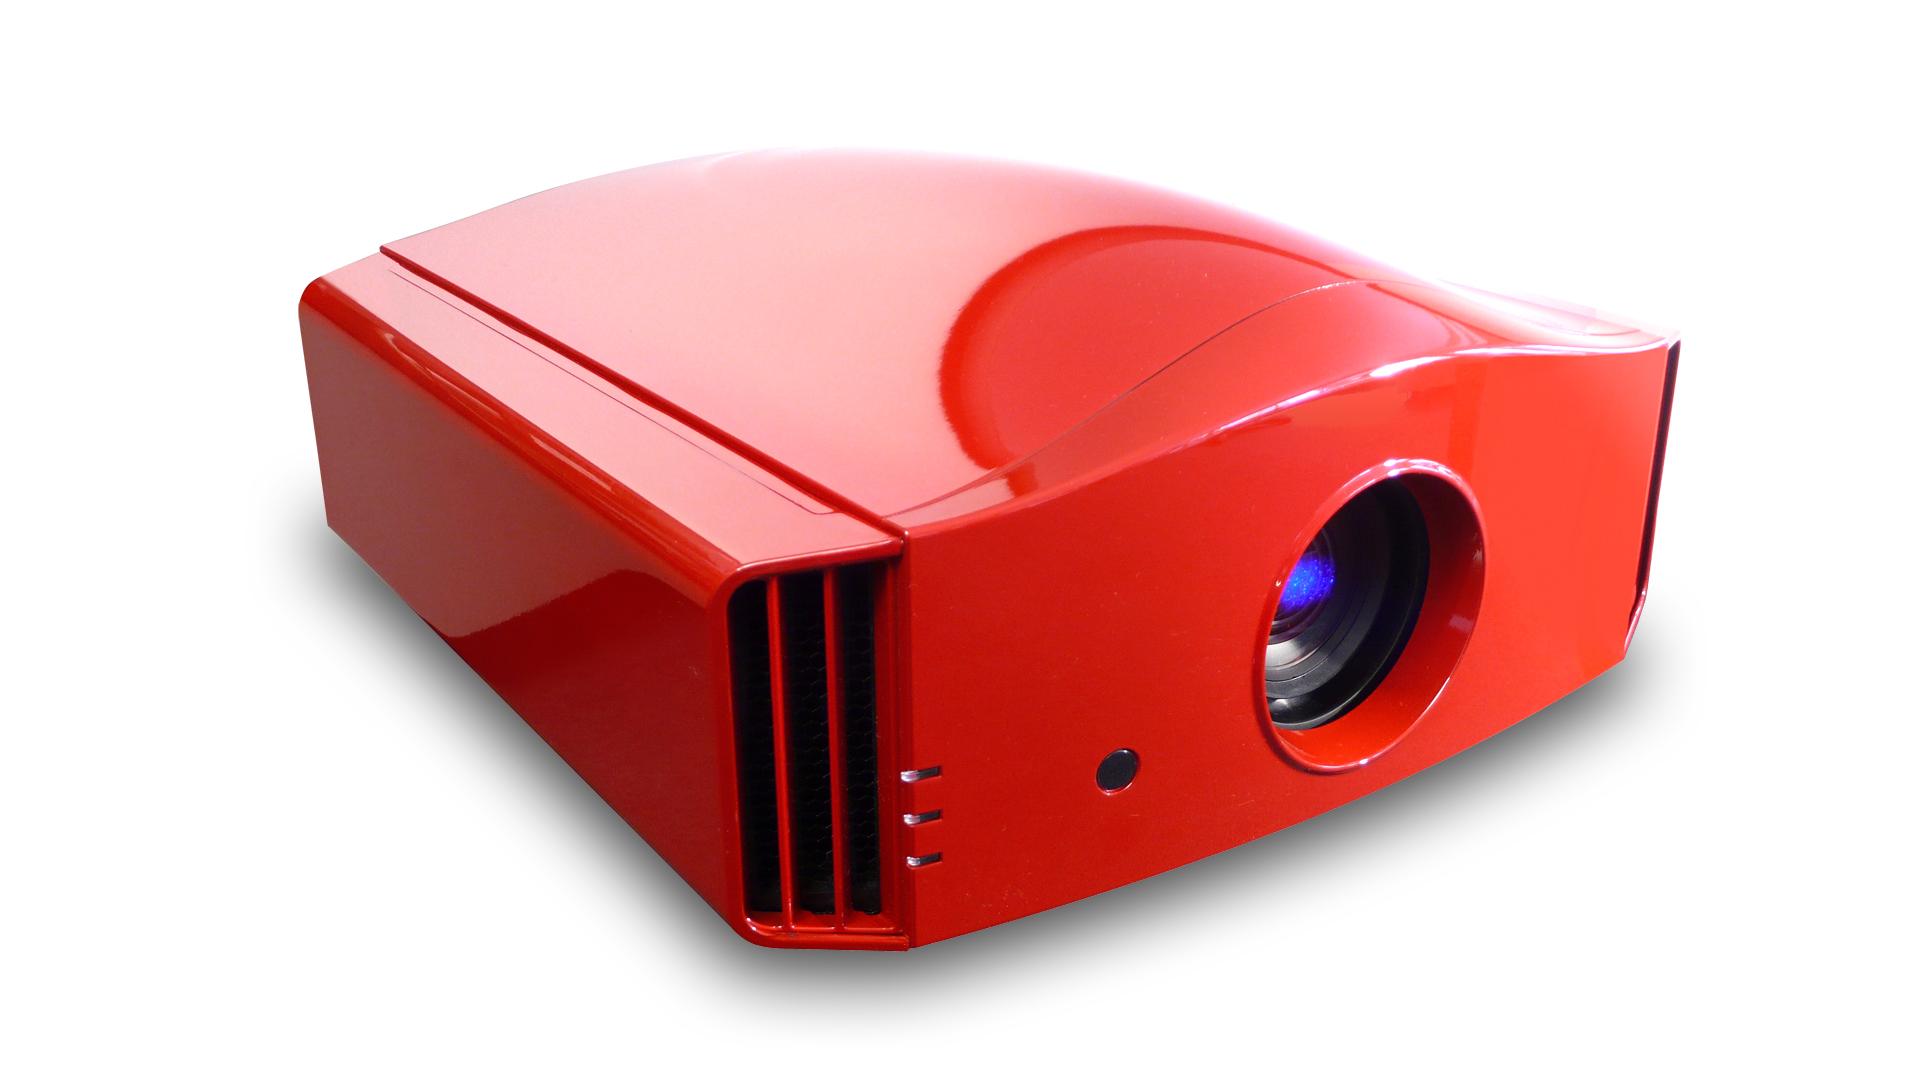 > Siglos 3 4K Active 3D Home Cinema Projector